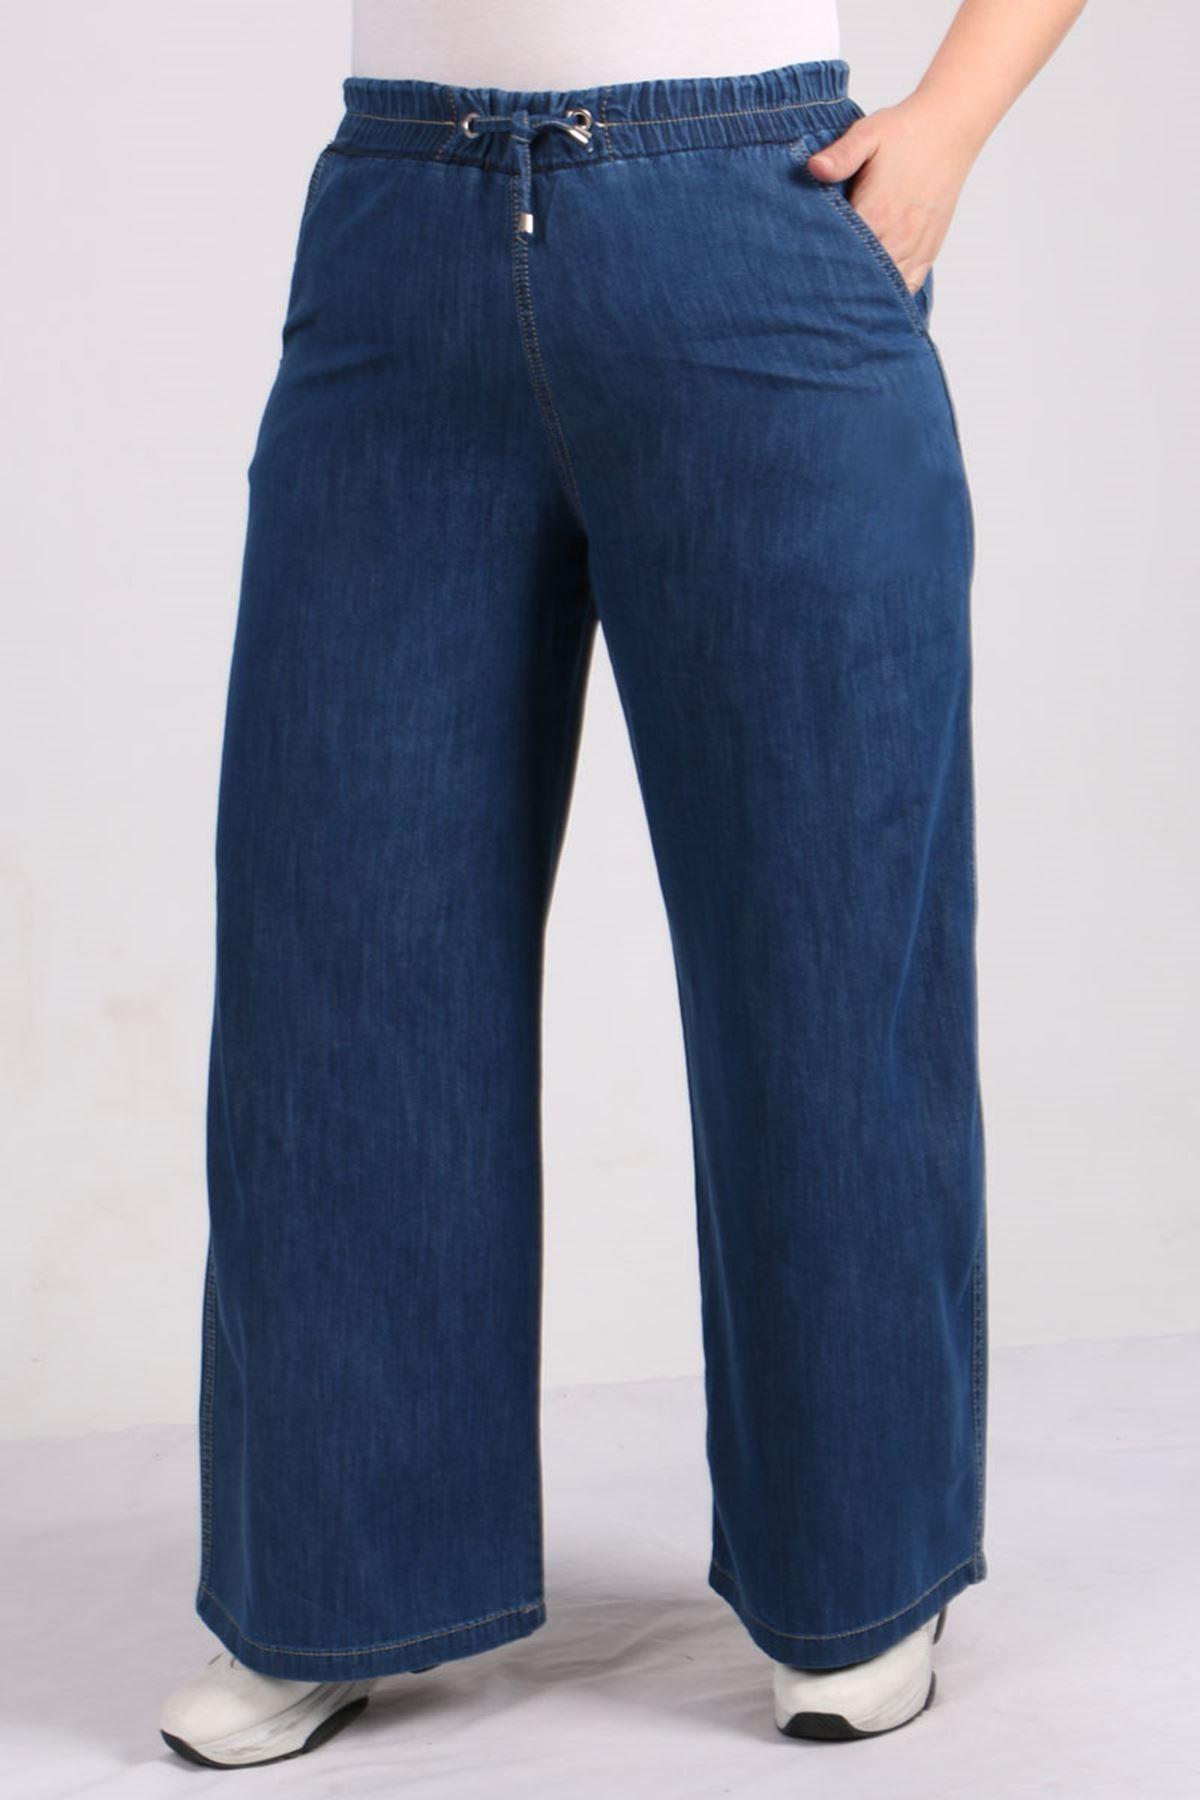 9124 Plus Size Elastic Waist Wide Leg Jeans - Dark Blue